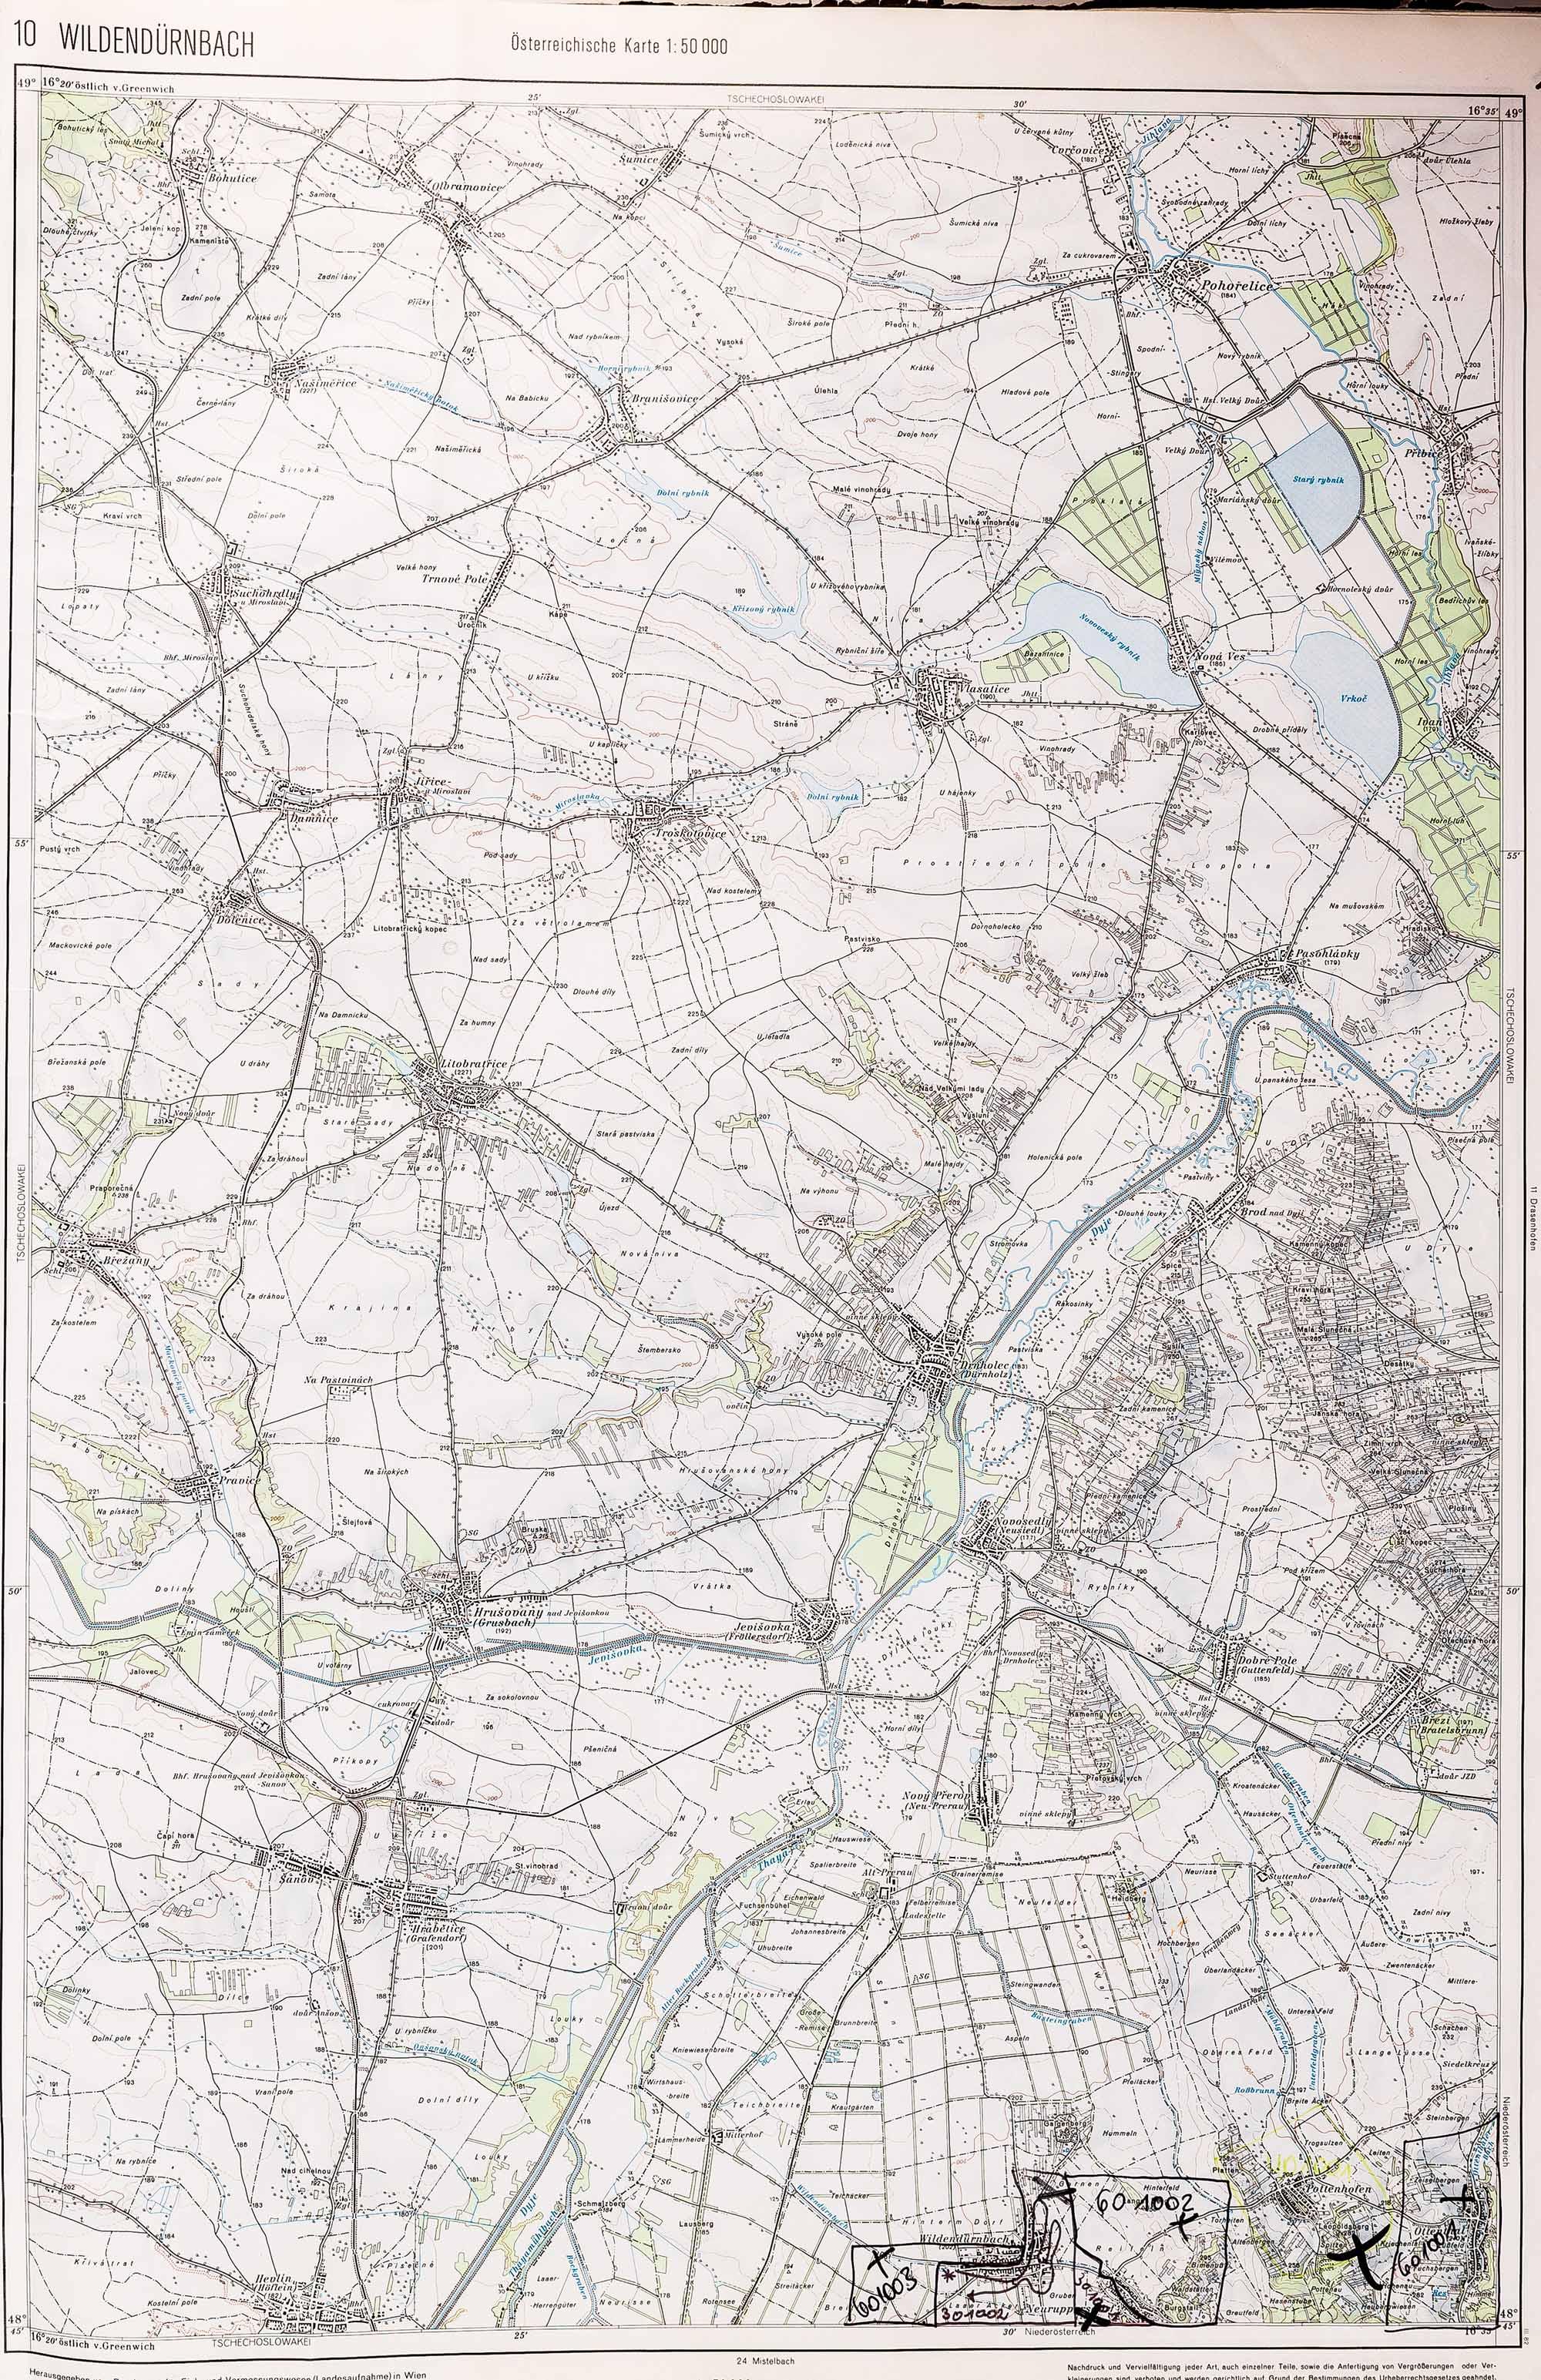 1983-1986 Karte 010